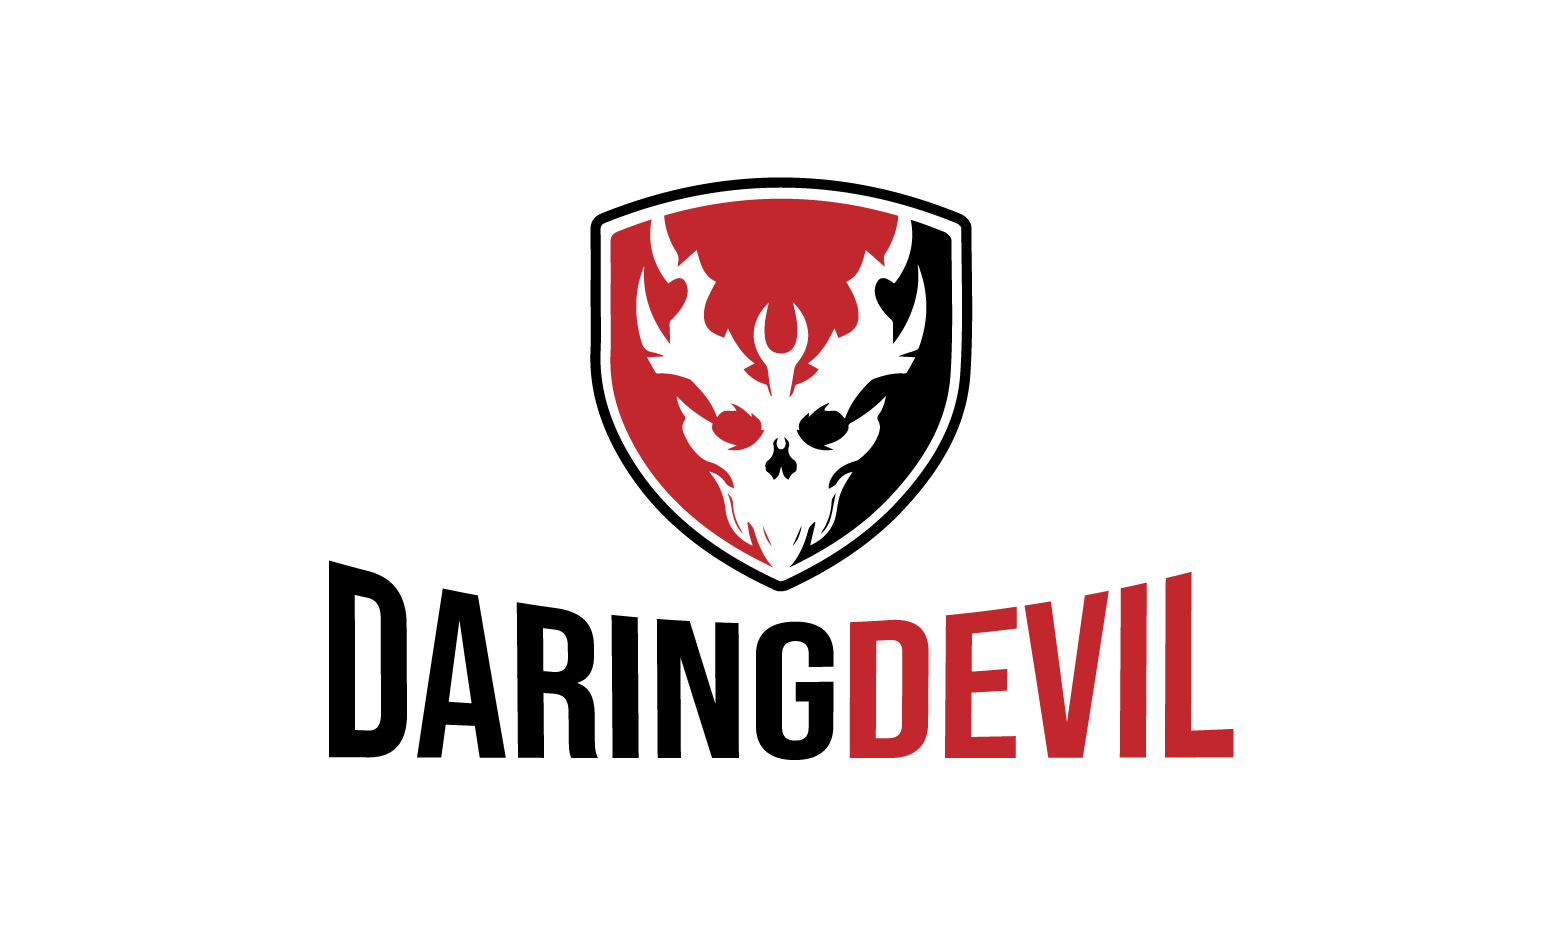 DaringDevil.com